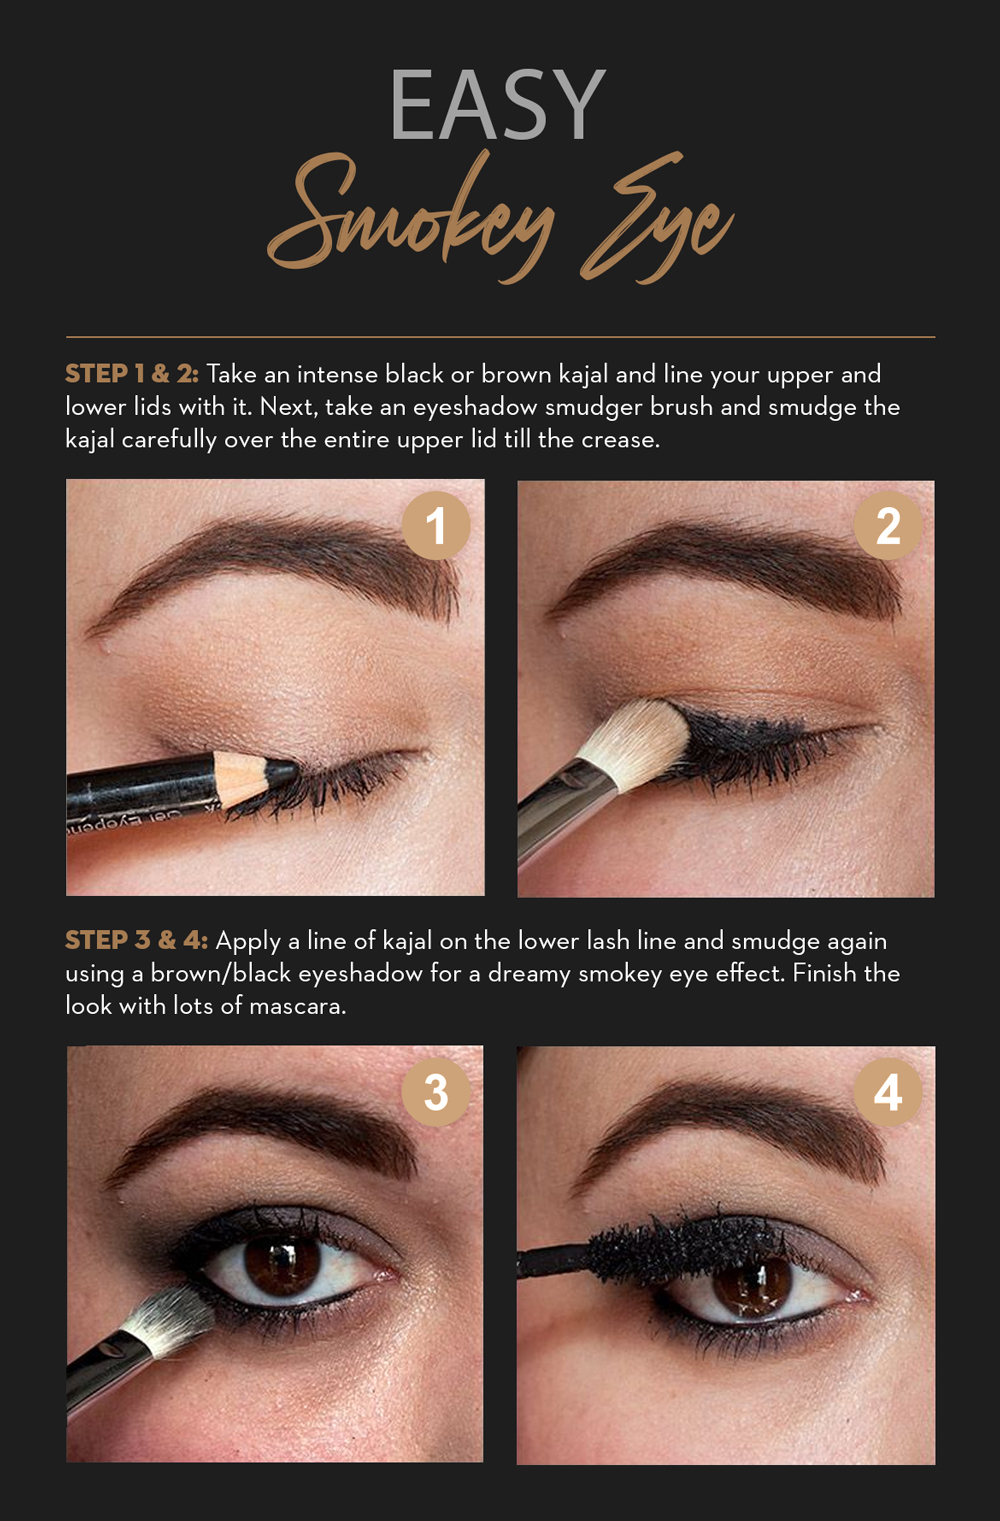 How to create a smokey eye with kohl or kajal1